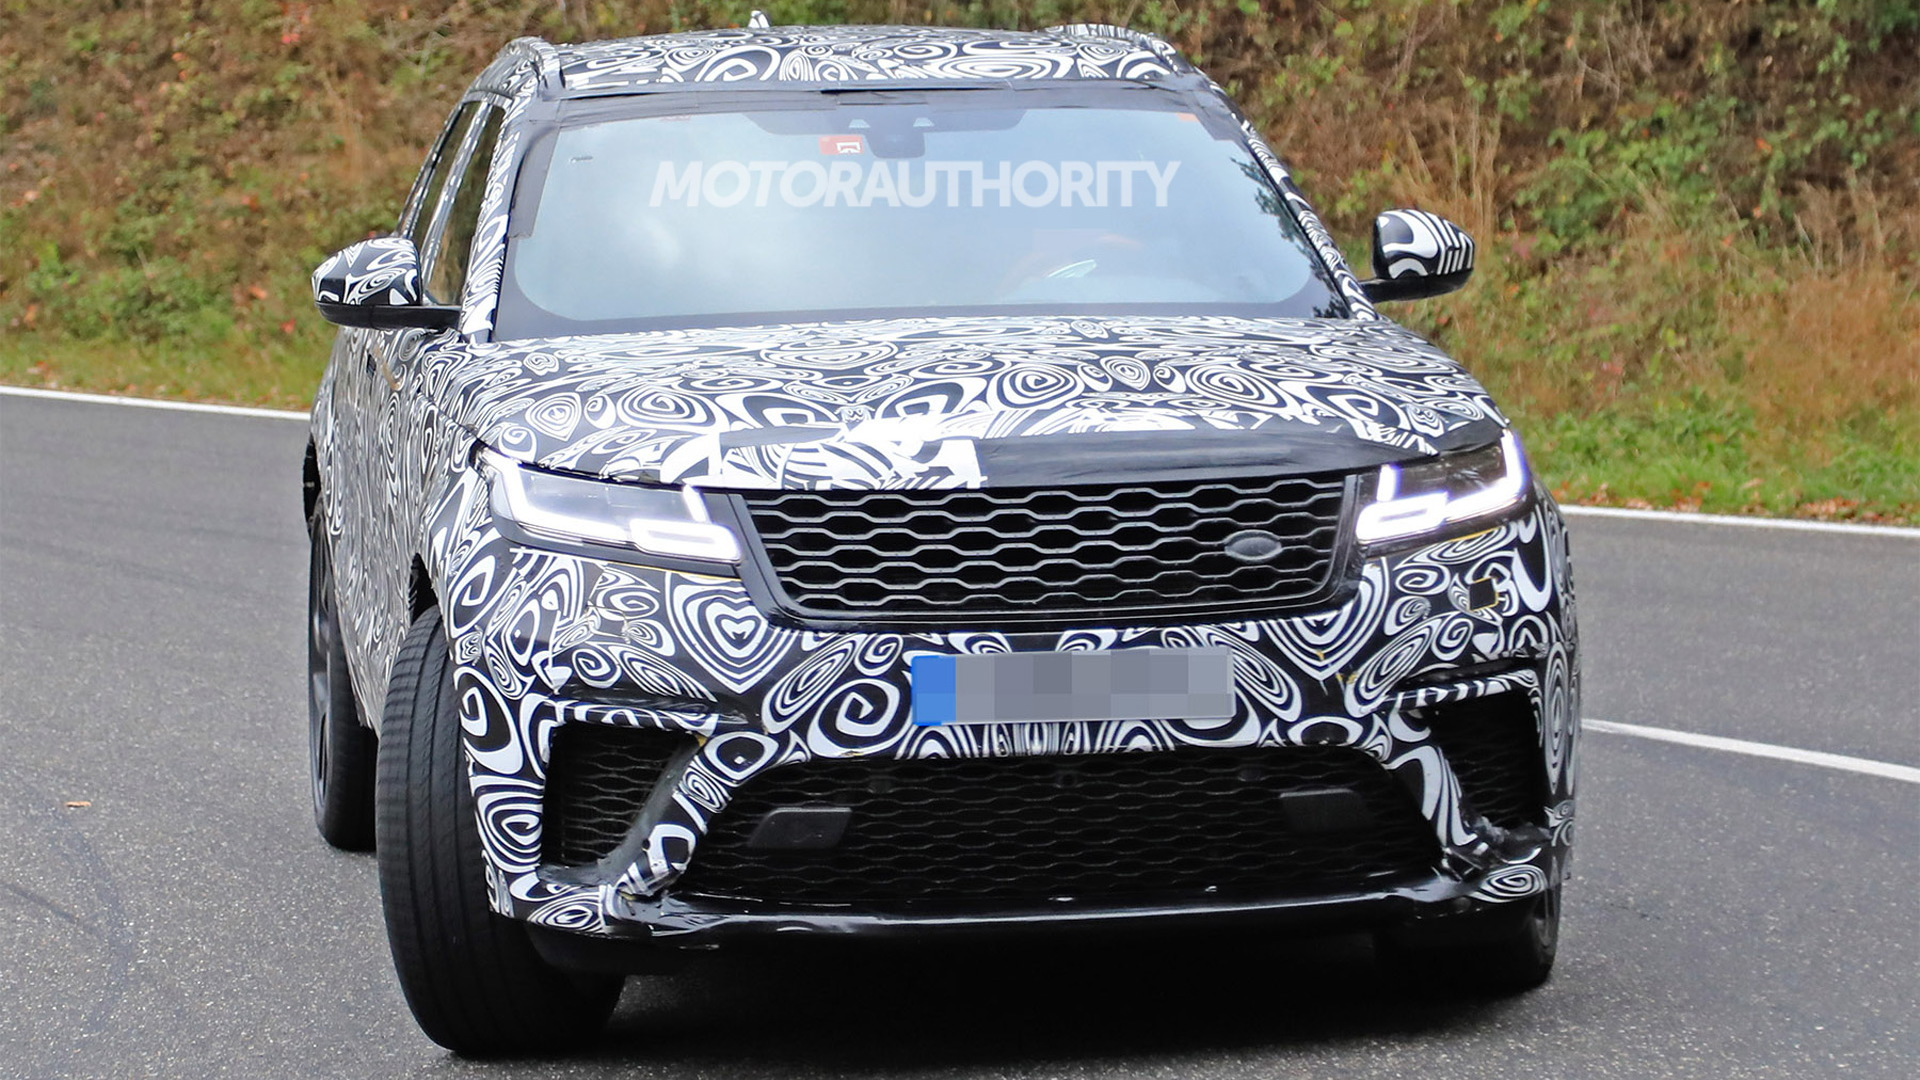 2019 Land Rover Range Rover Velar spy shots - Image via S. Baldauf/SB-Medien